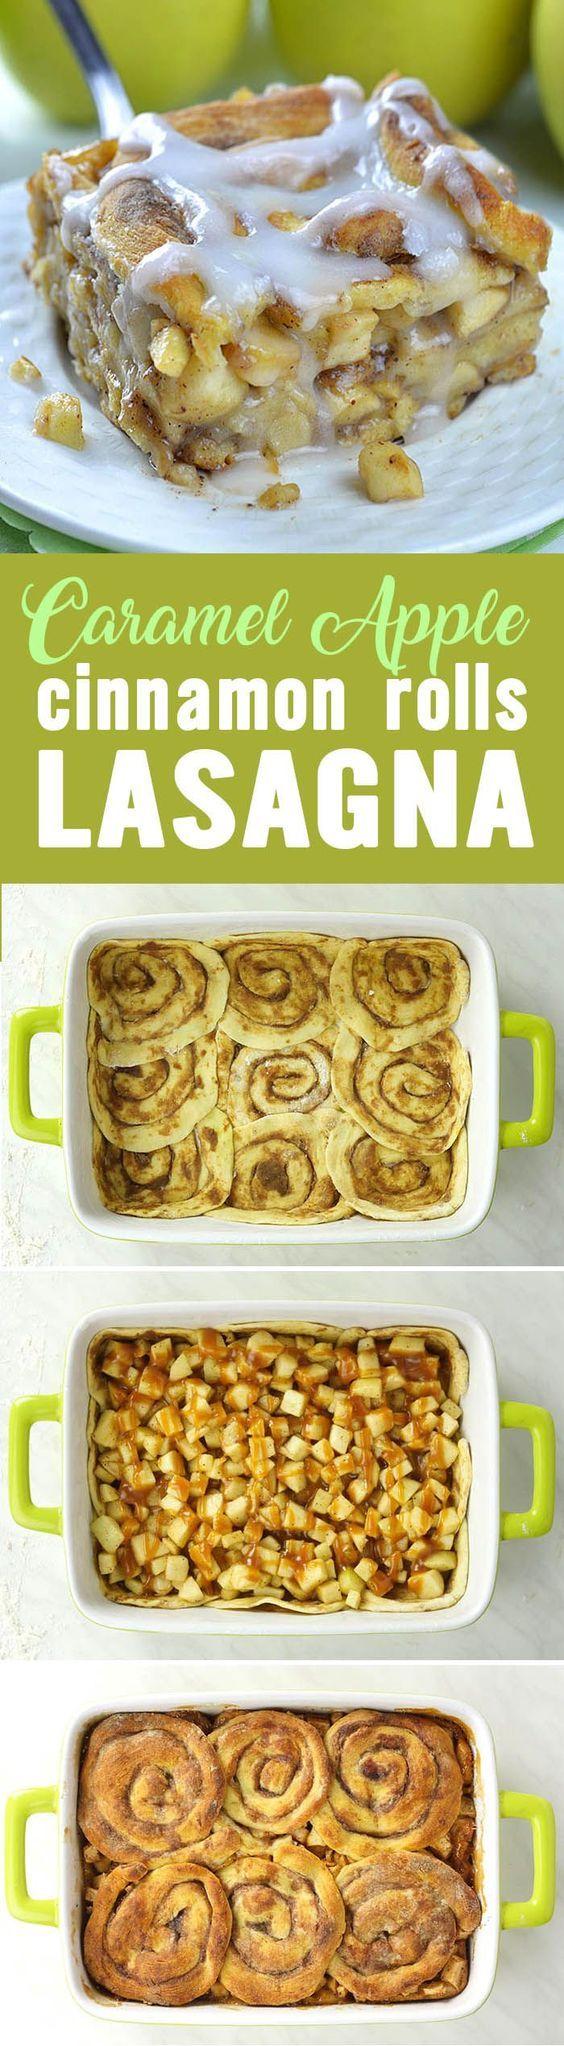 Caramel Apple Cinnamon Roll Lasagna